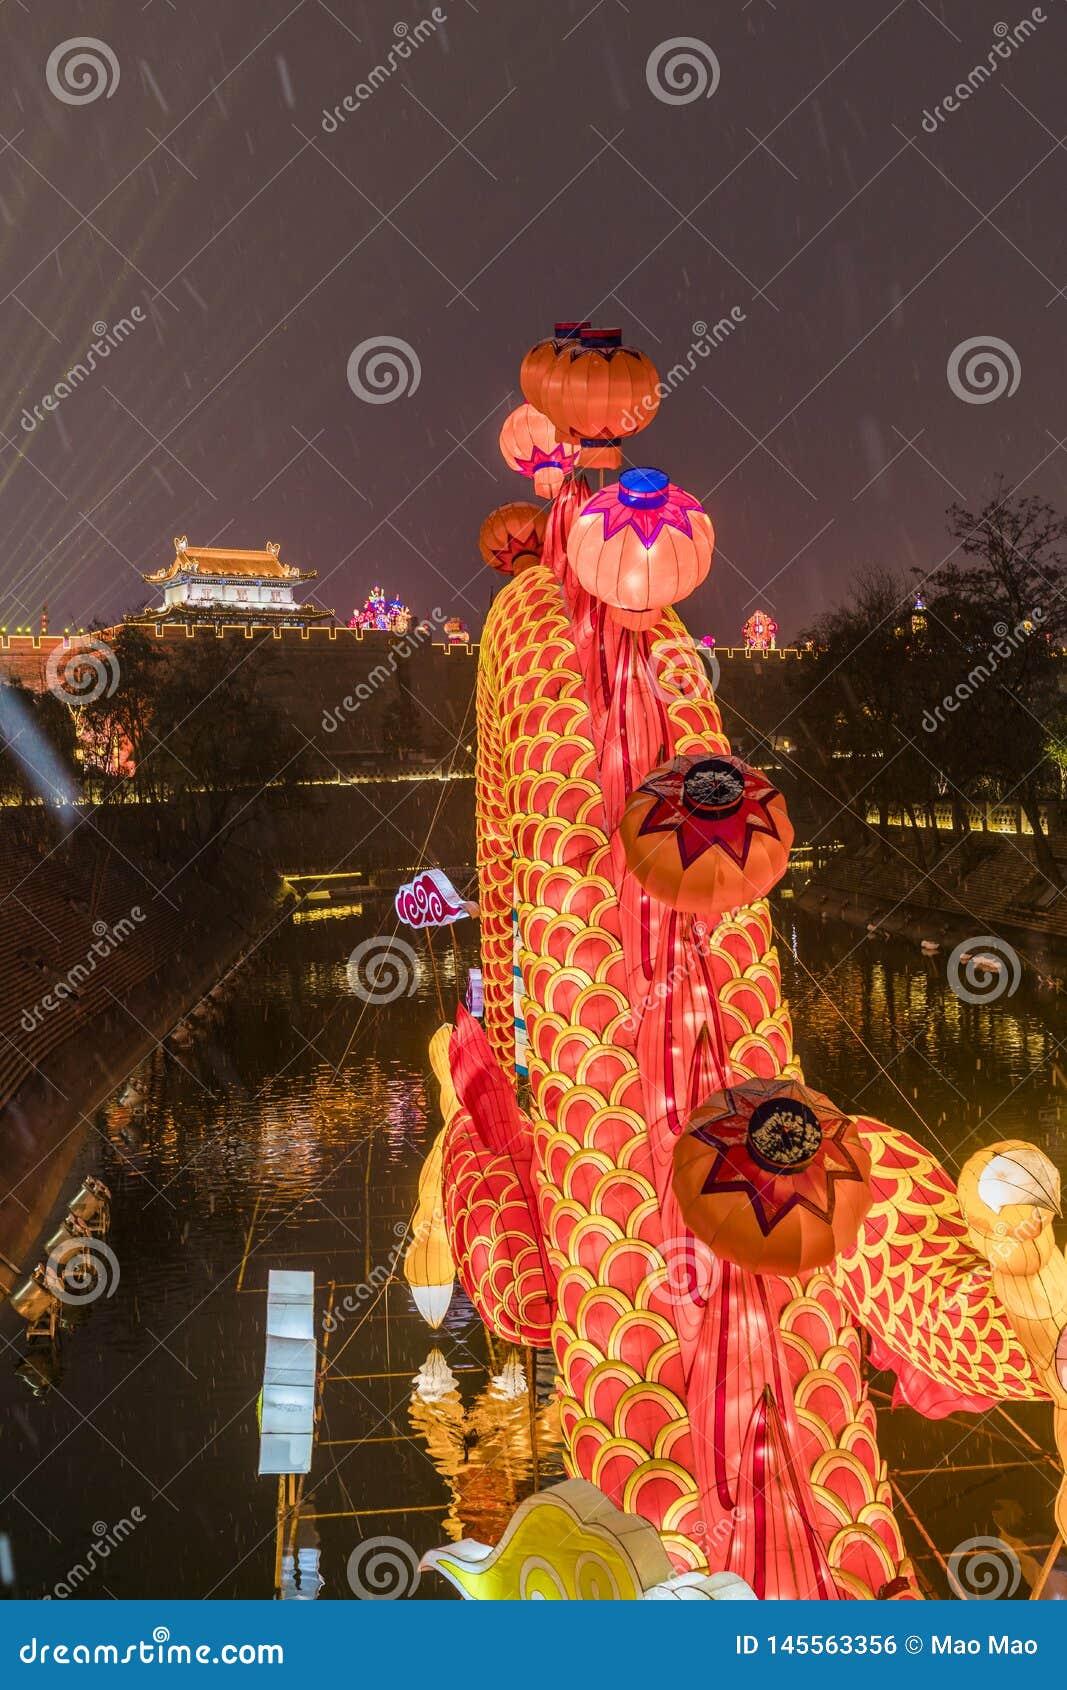 Laterne und Beleuchtenshow am S?dtor der alten Stadtmauer f?r feiern chinesisches Fr?hlingsfest, Xi an, Shaanxi, Porzellan